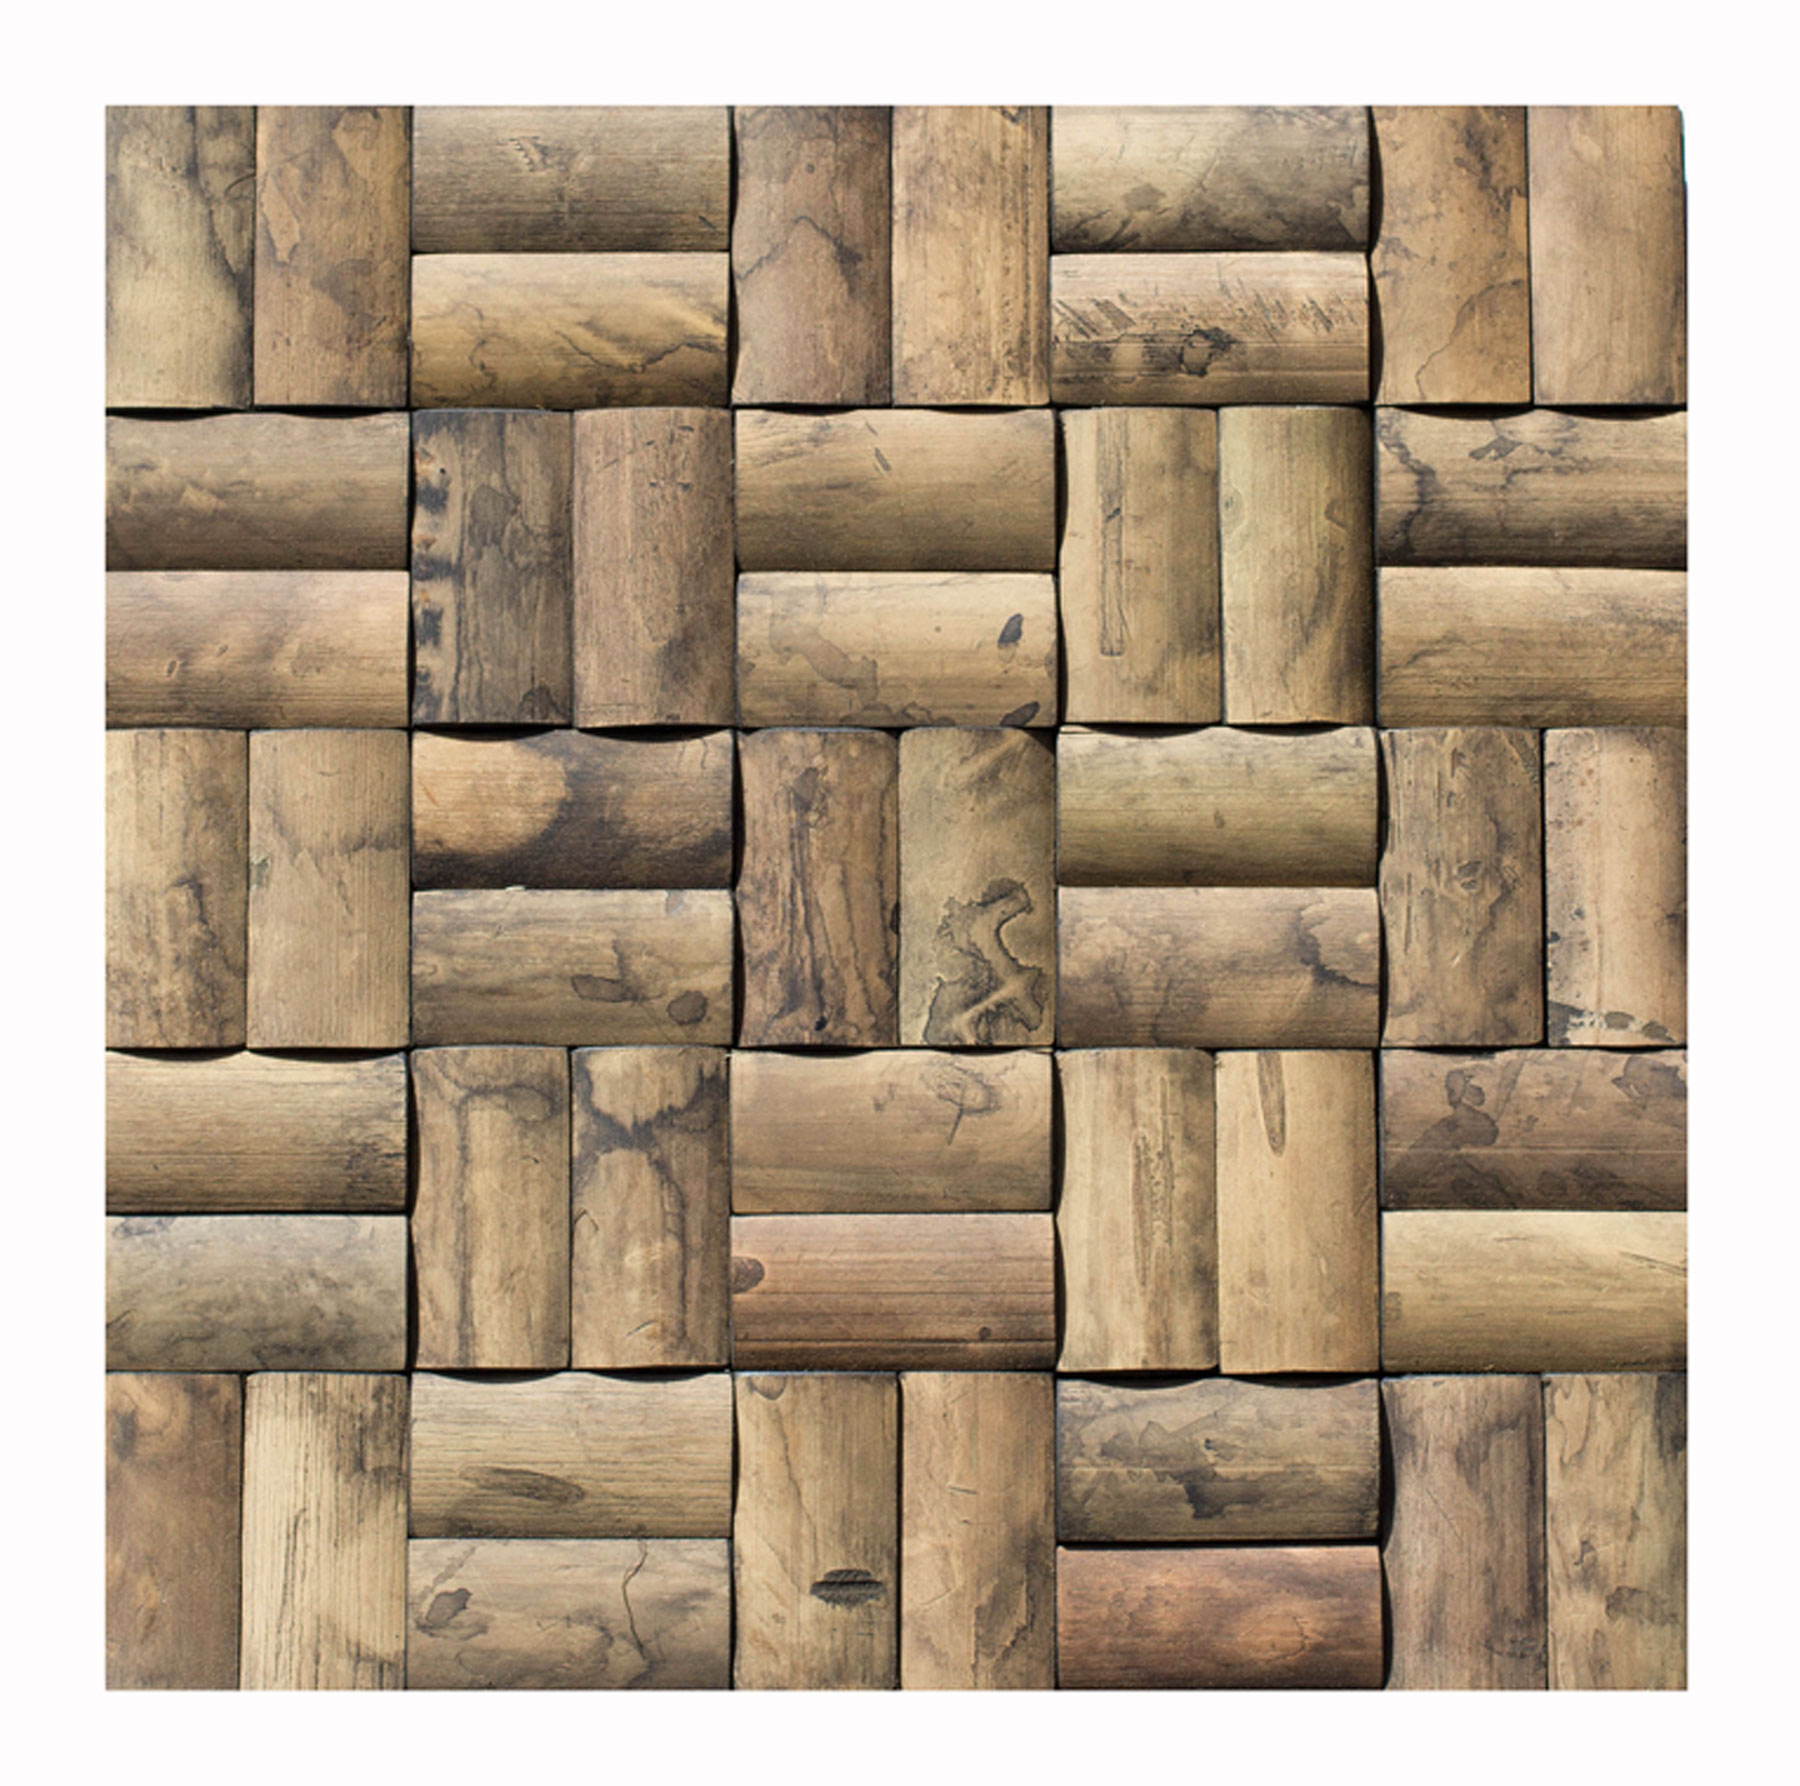 Holz-Verblender-Fliesen